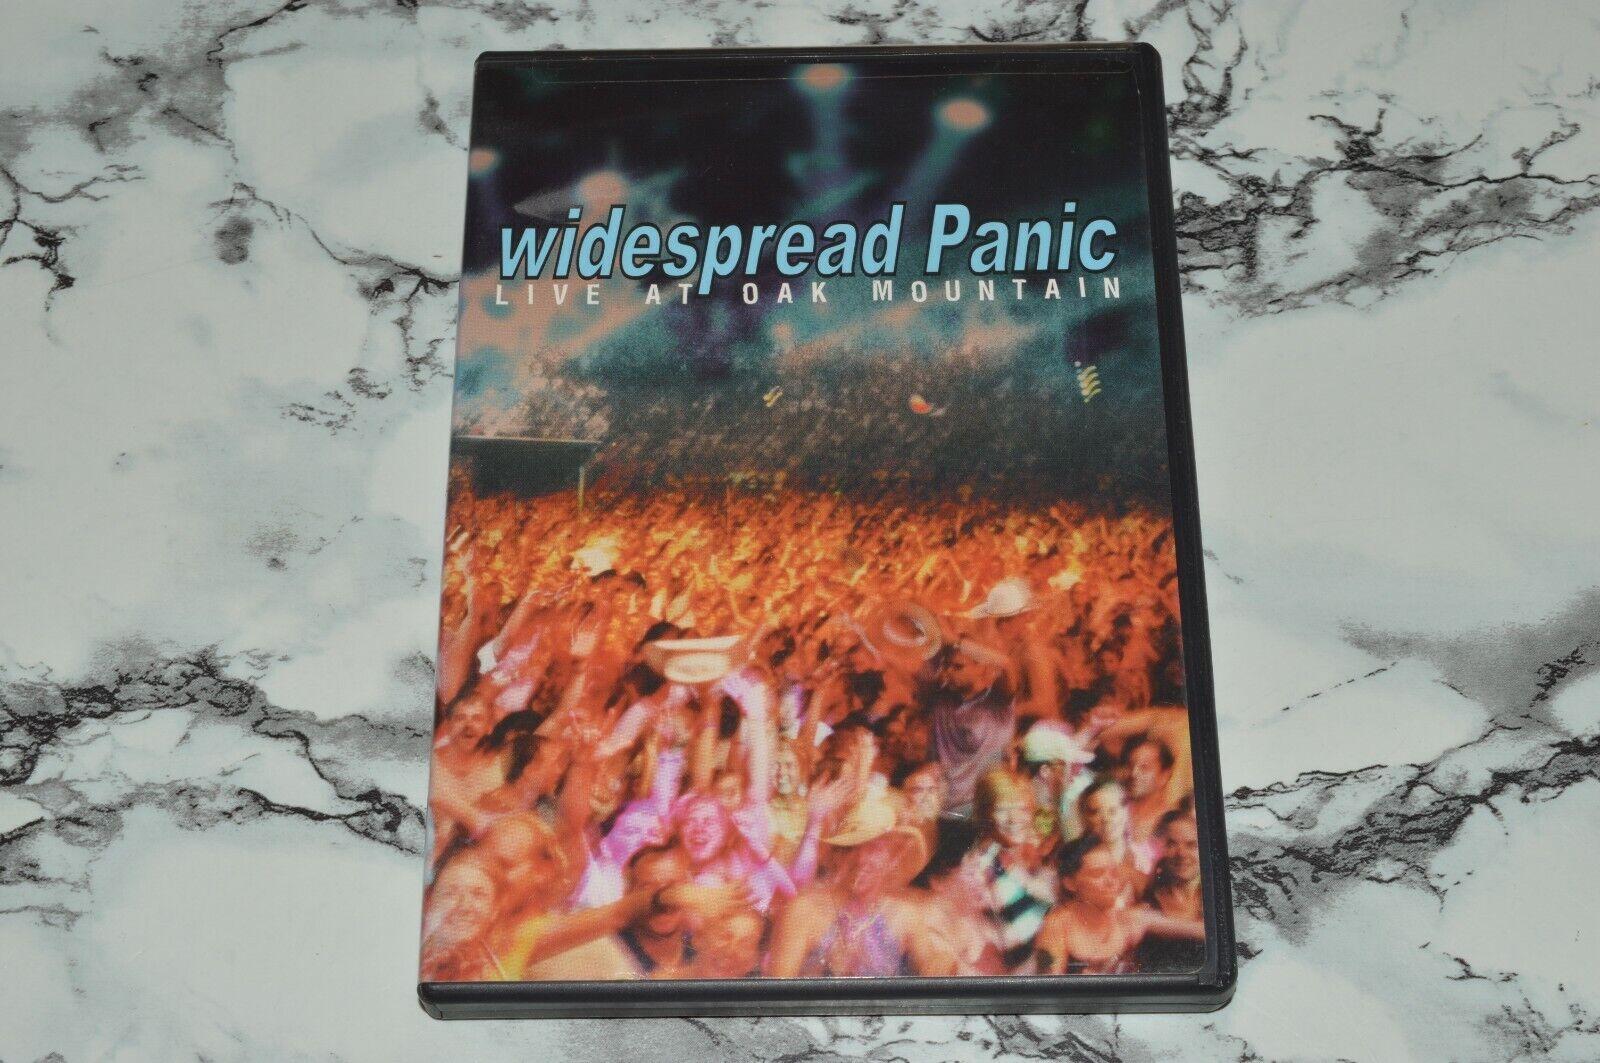 Widespread Panic - Live At Oak Mountain 2-Disc DVD Set, 2001  - $12.68